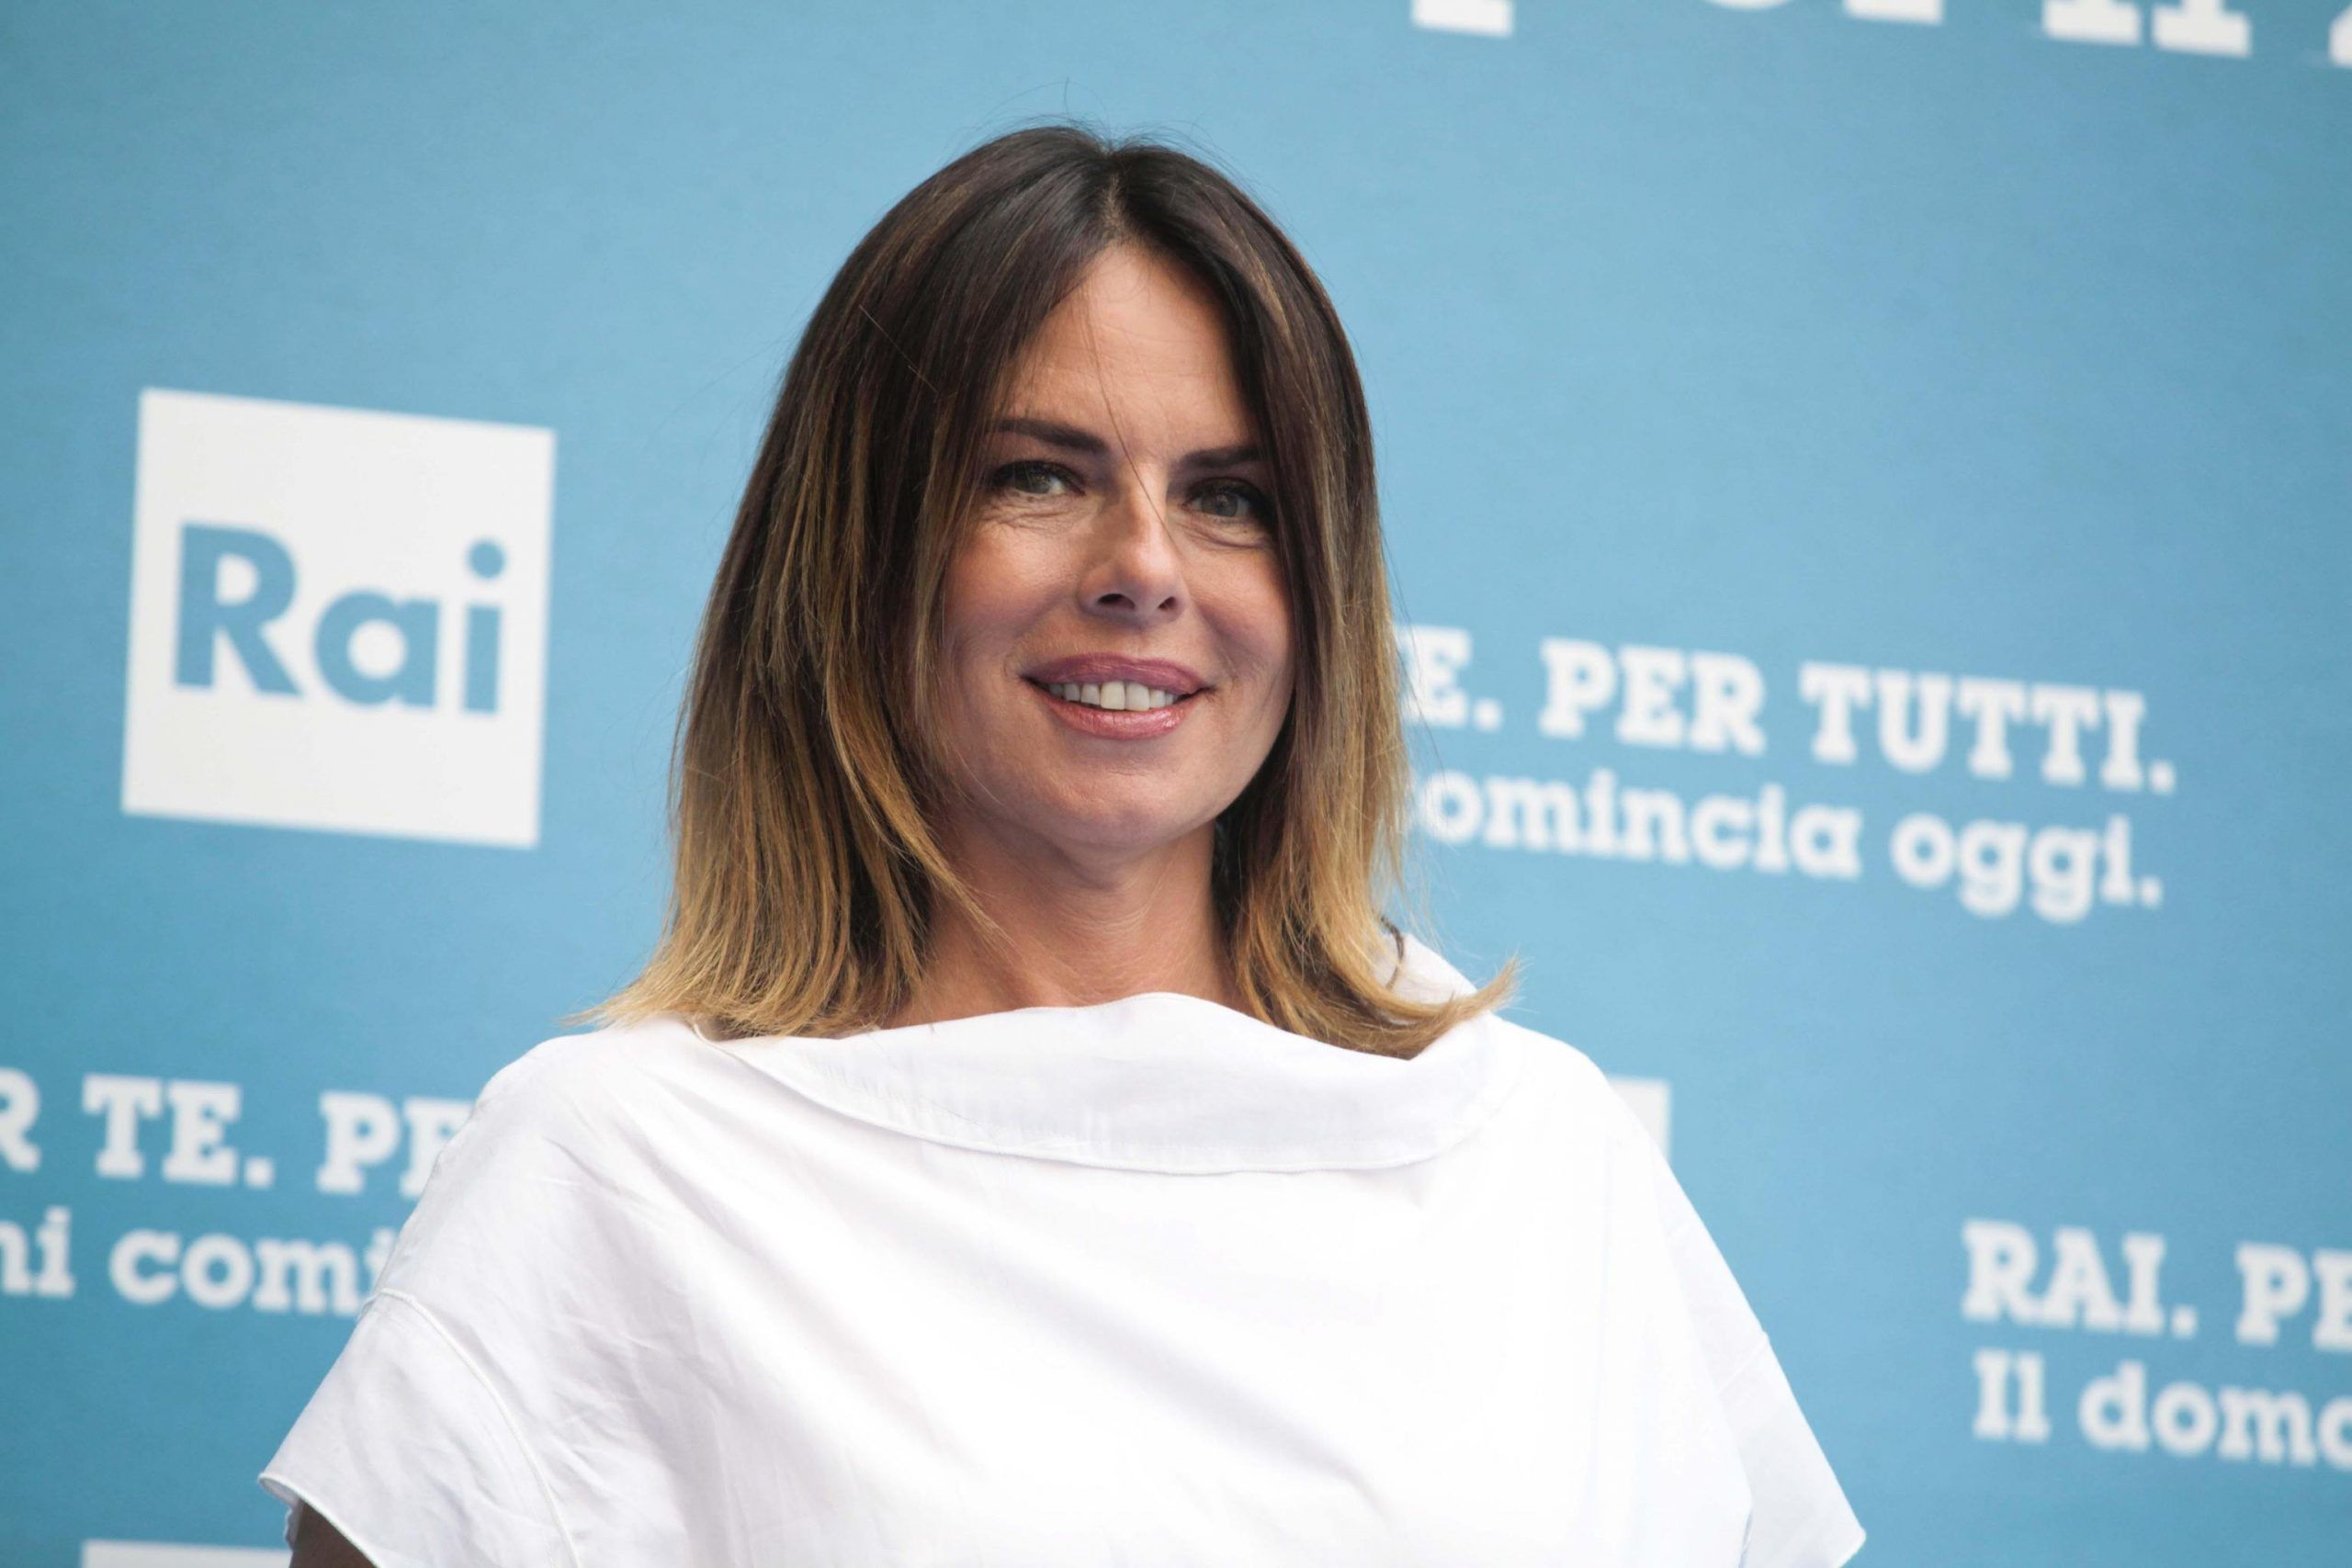 Paola Perego senza veli